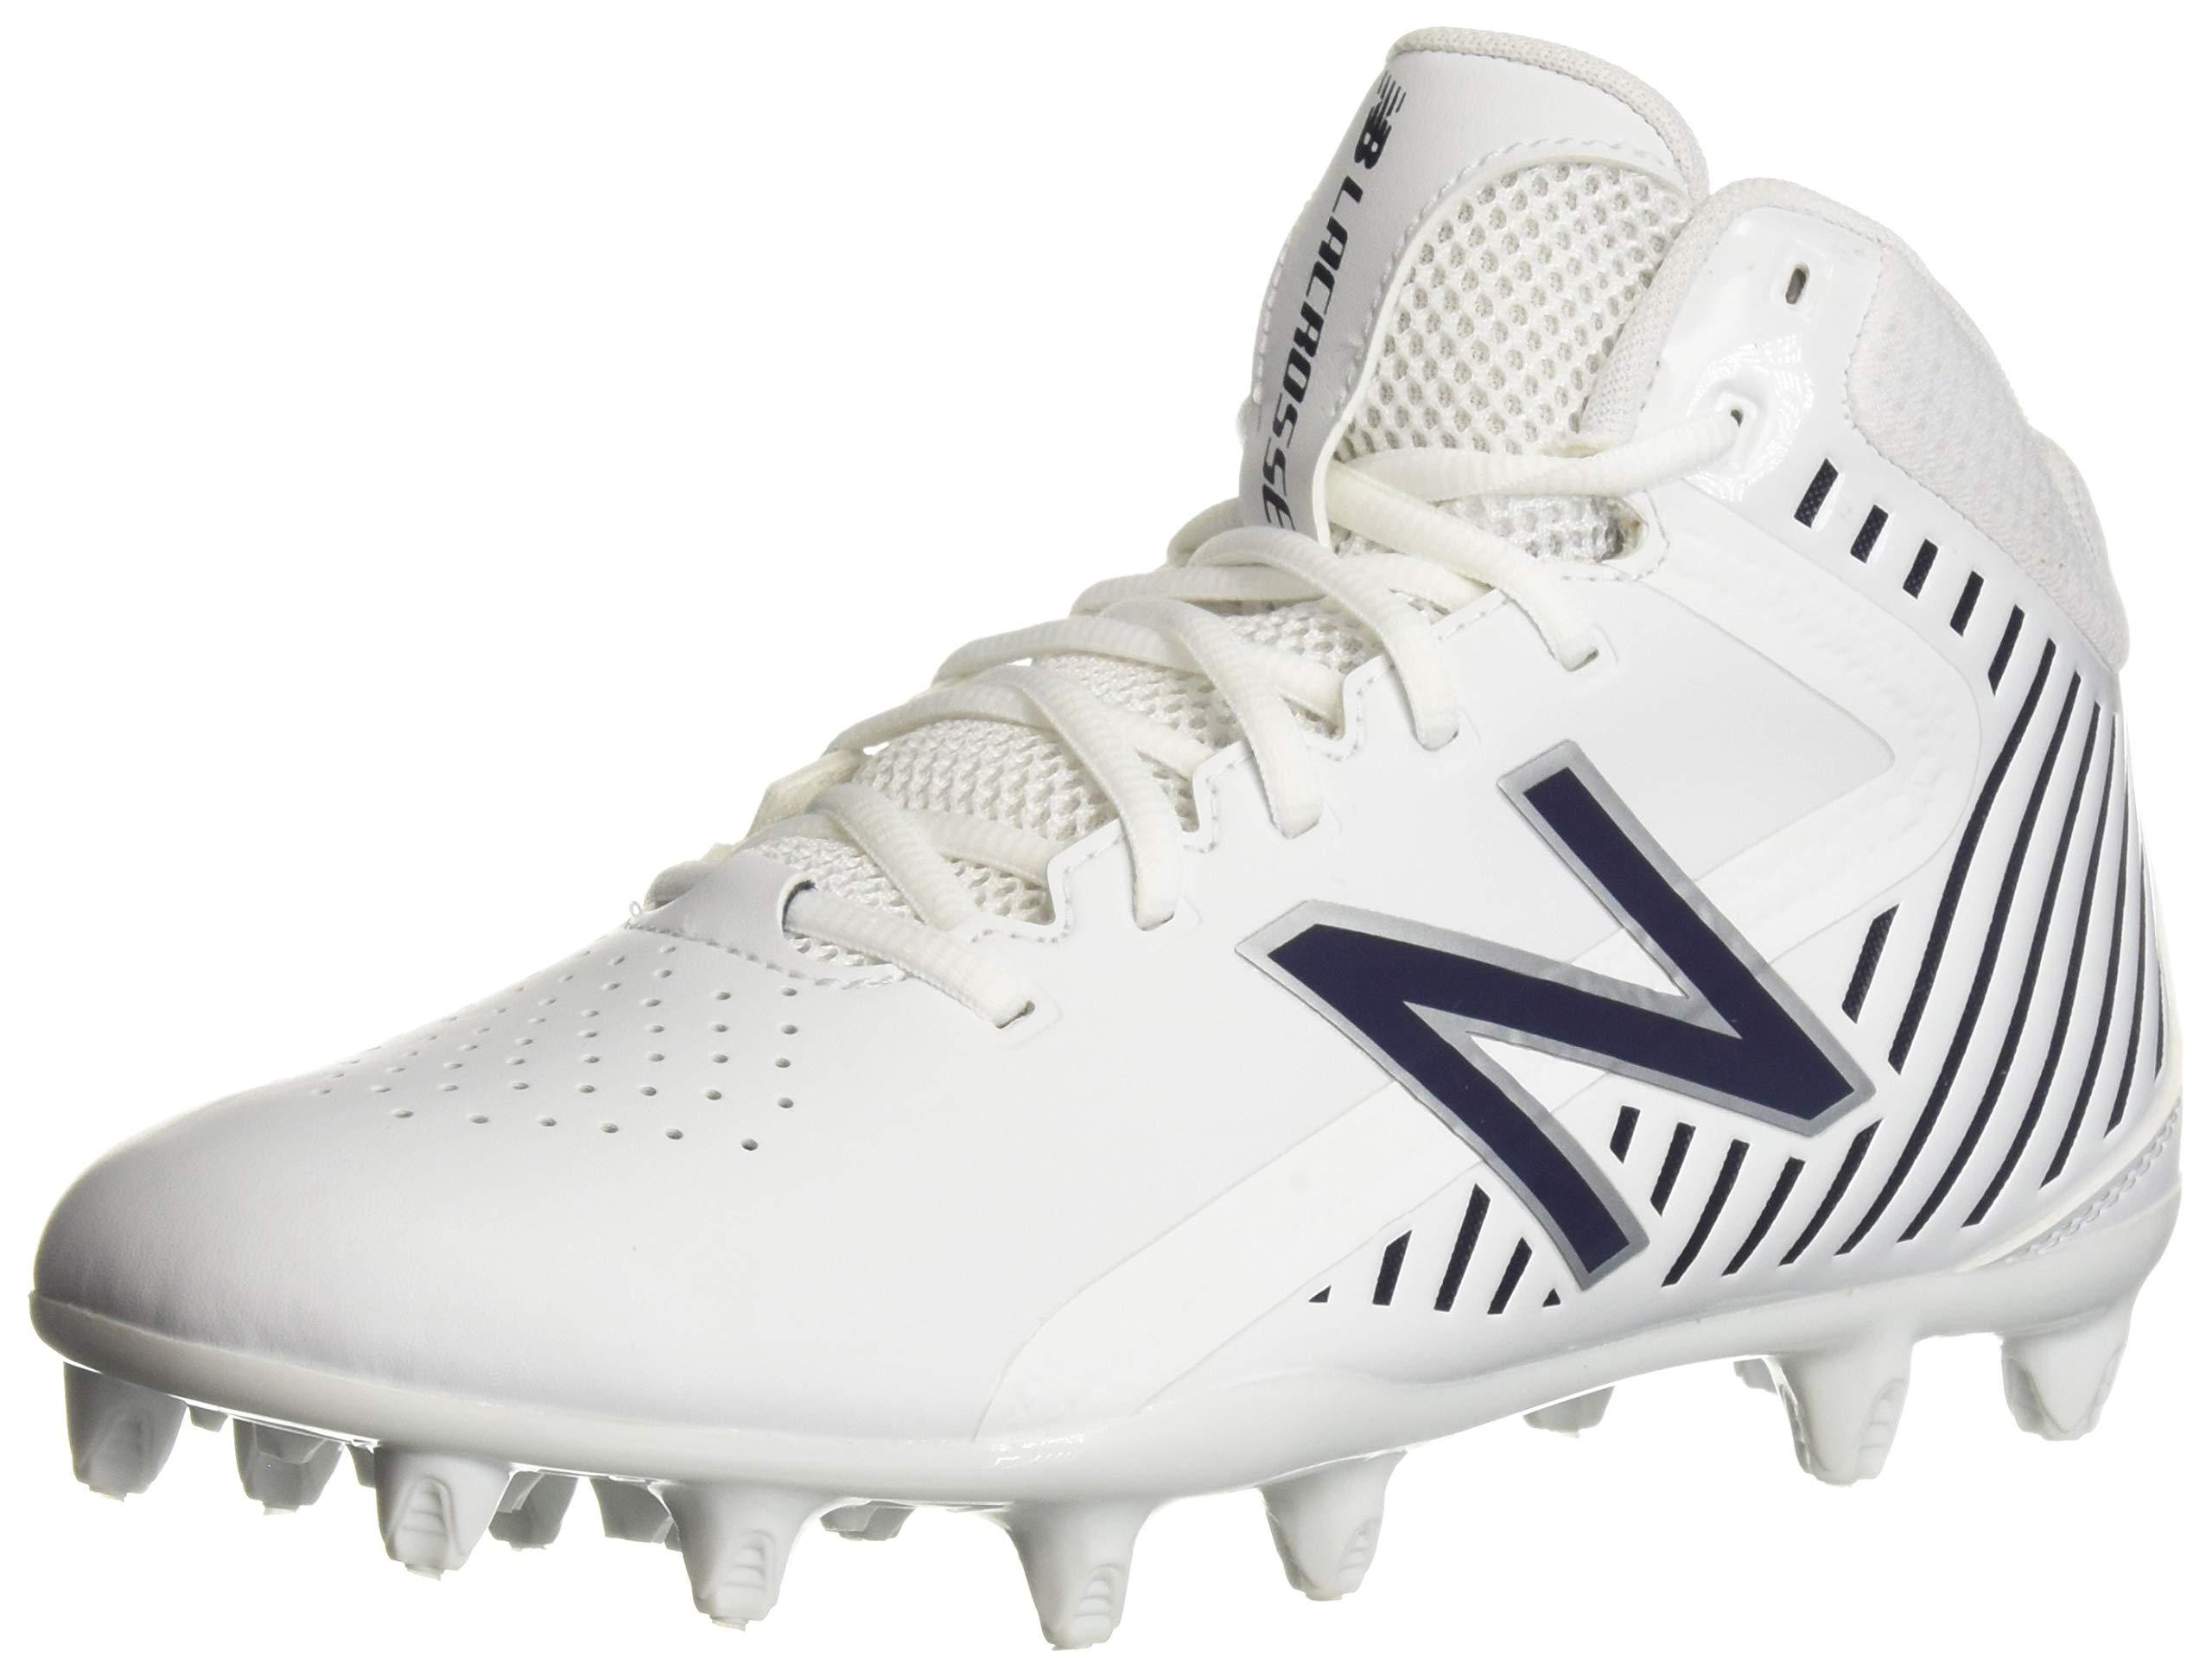 New Balance Men's Rush v1 Lacrosse Speed Shoe, White/Blue, 9 D US